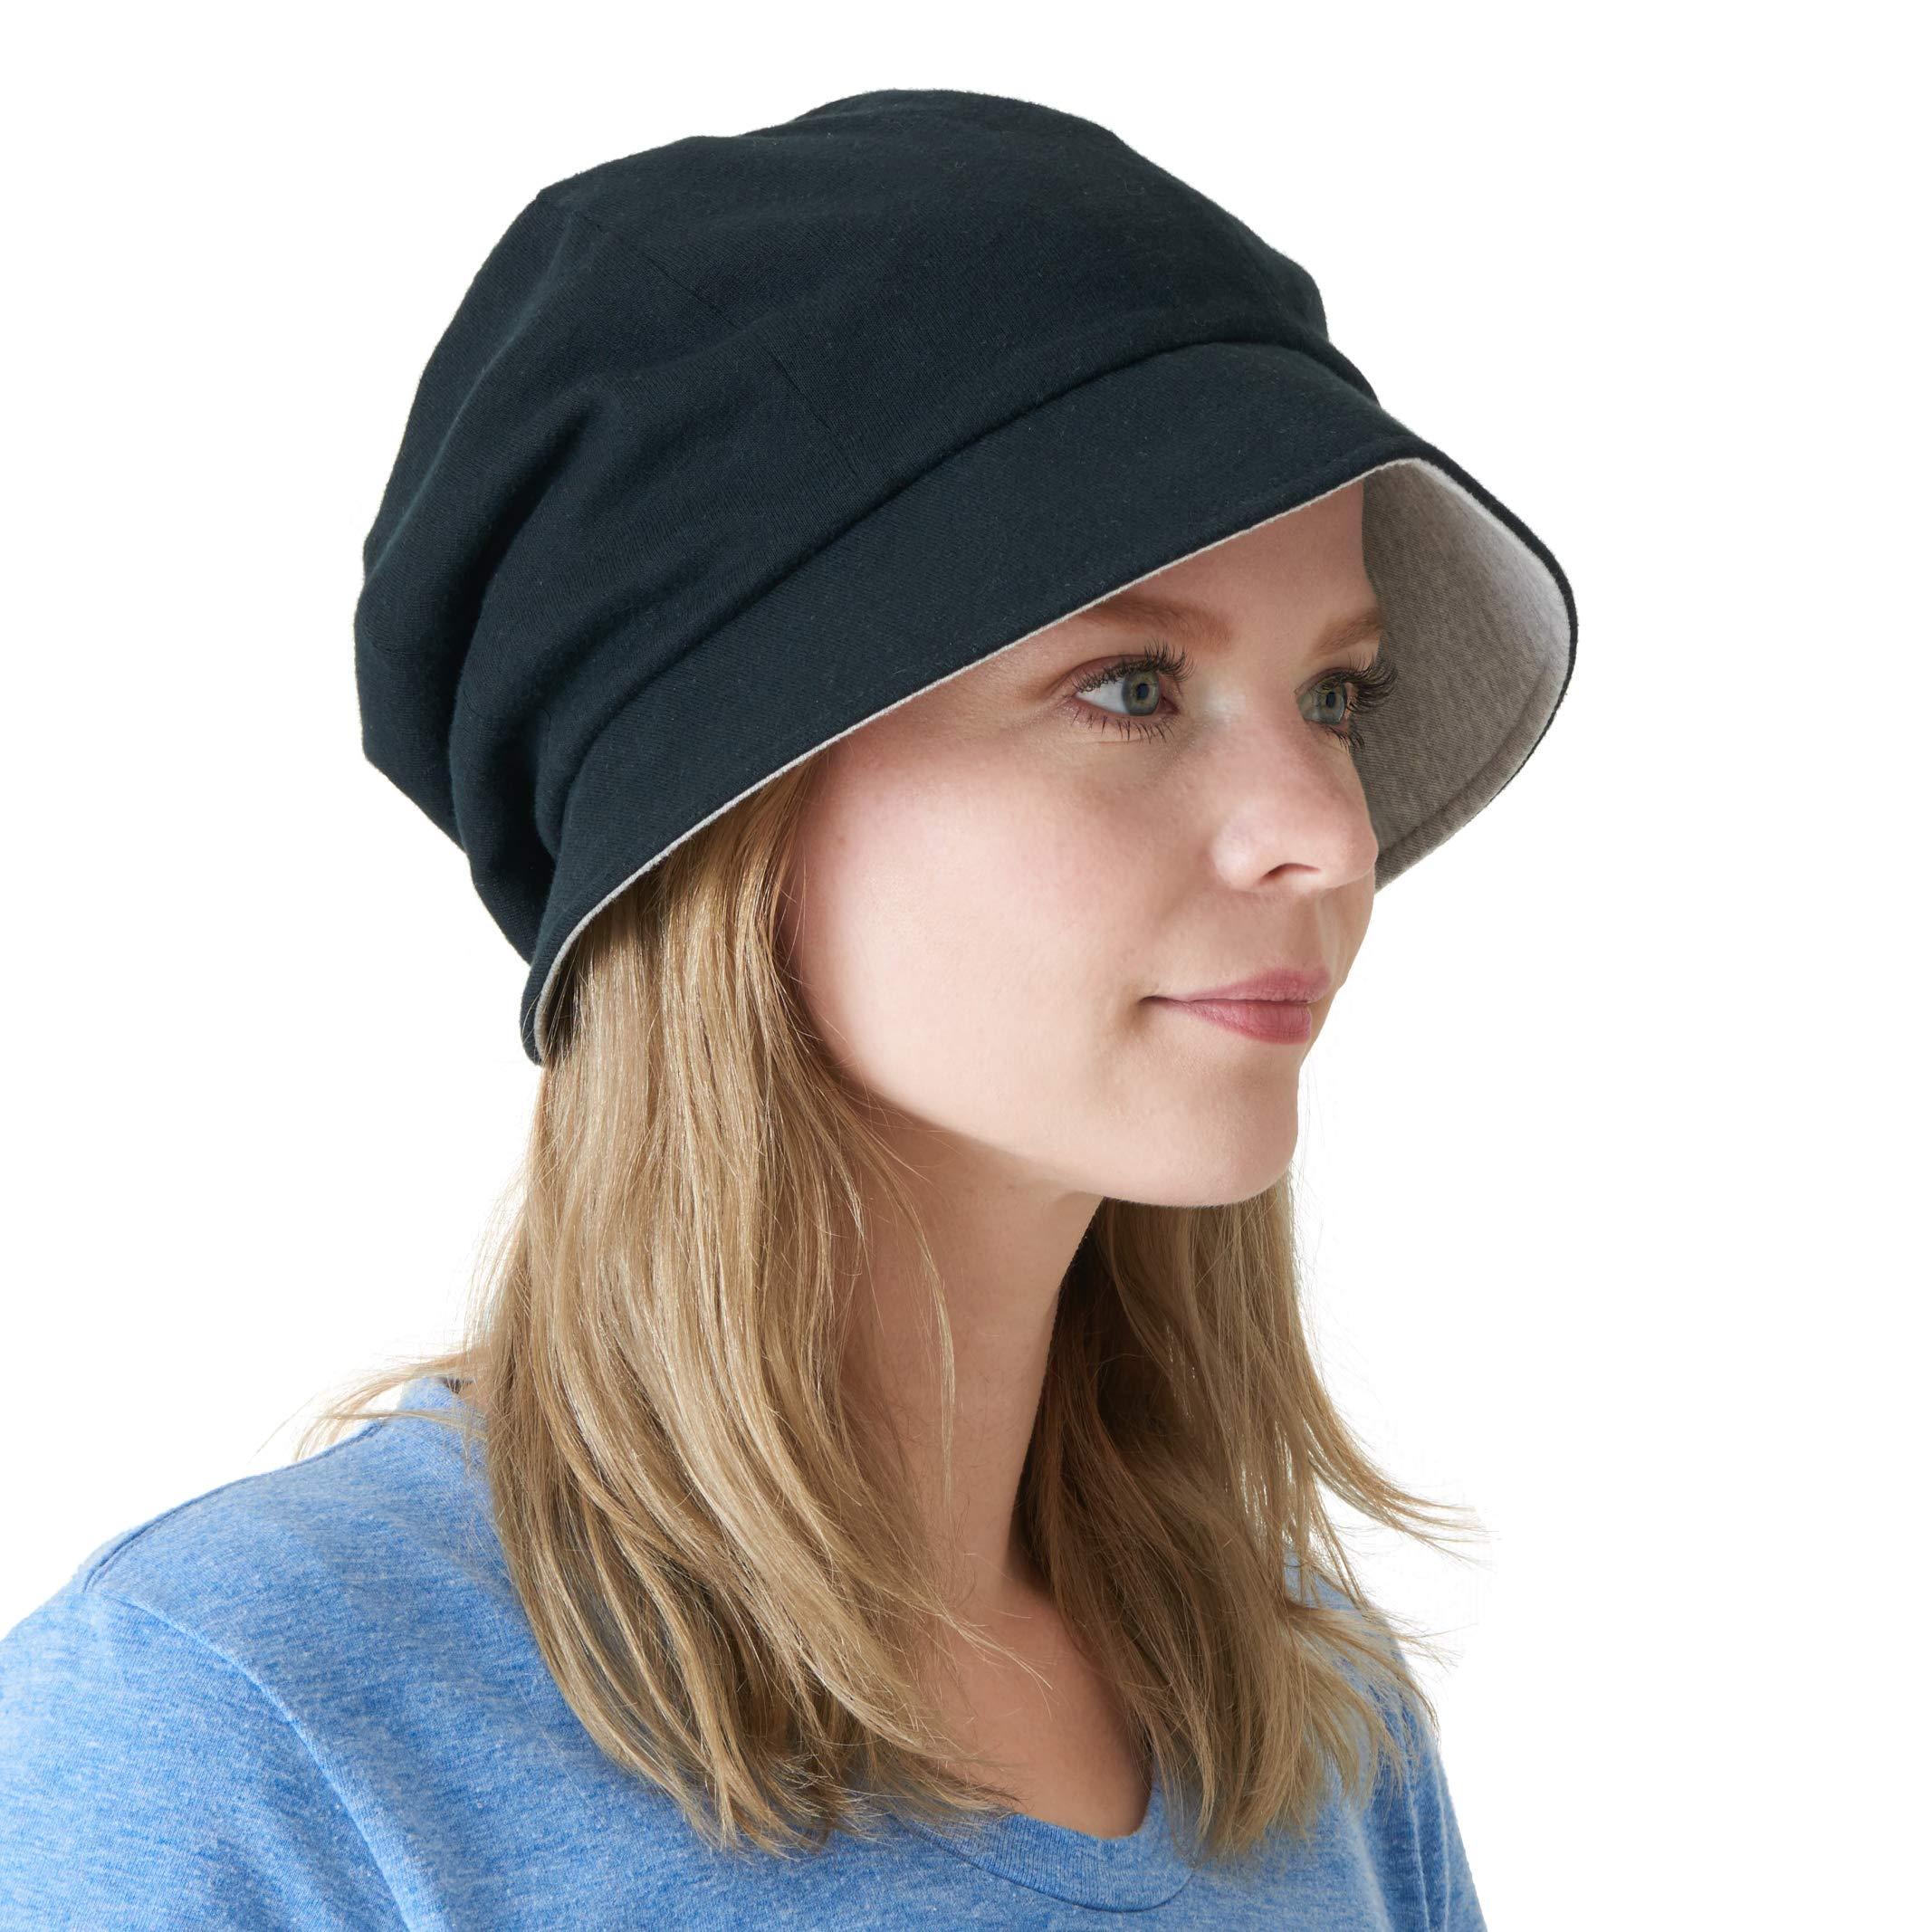 CHARM Casualbox   Womens Sun Hat Organic Cotton Reversible Japanese Design Black & Light Gray